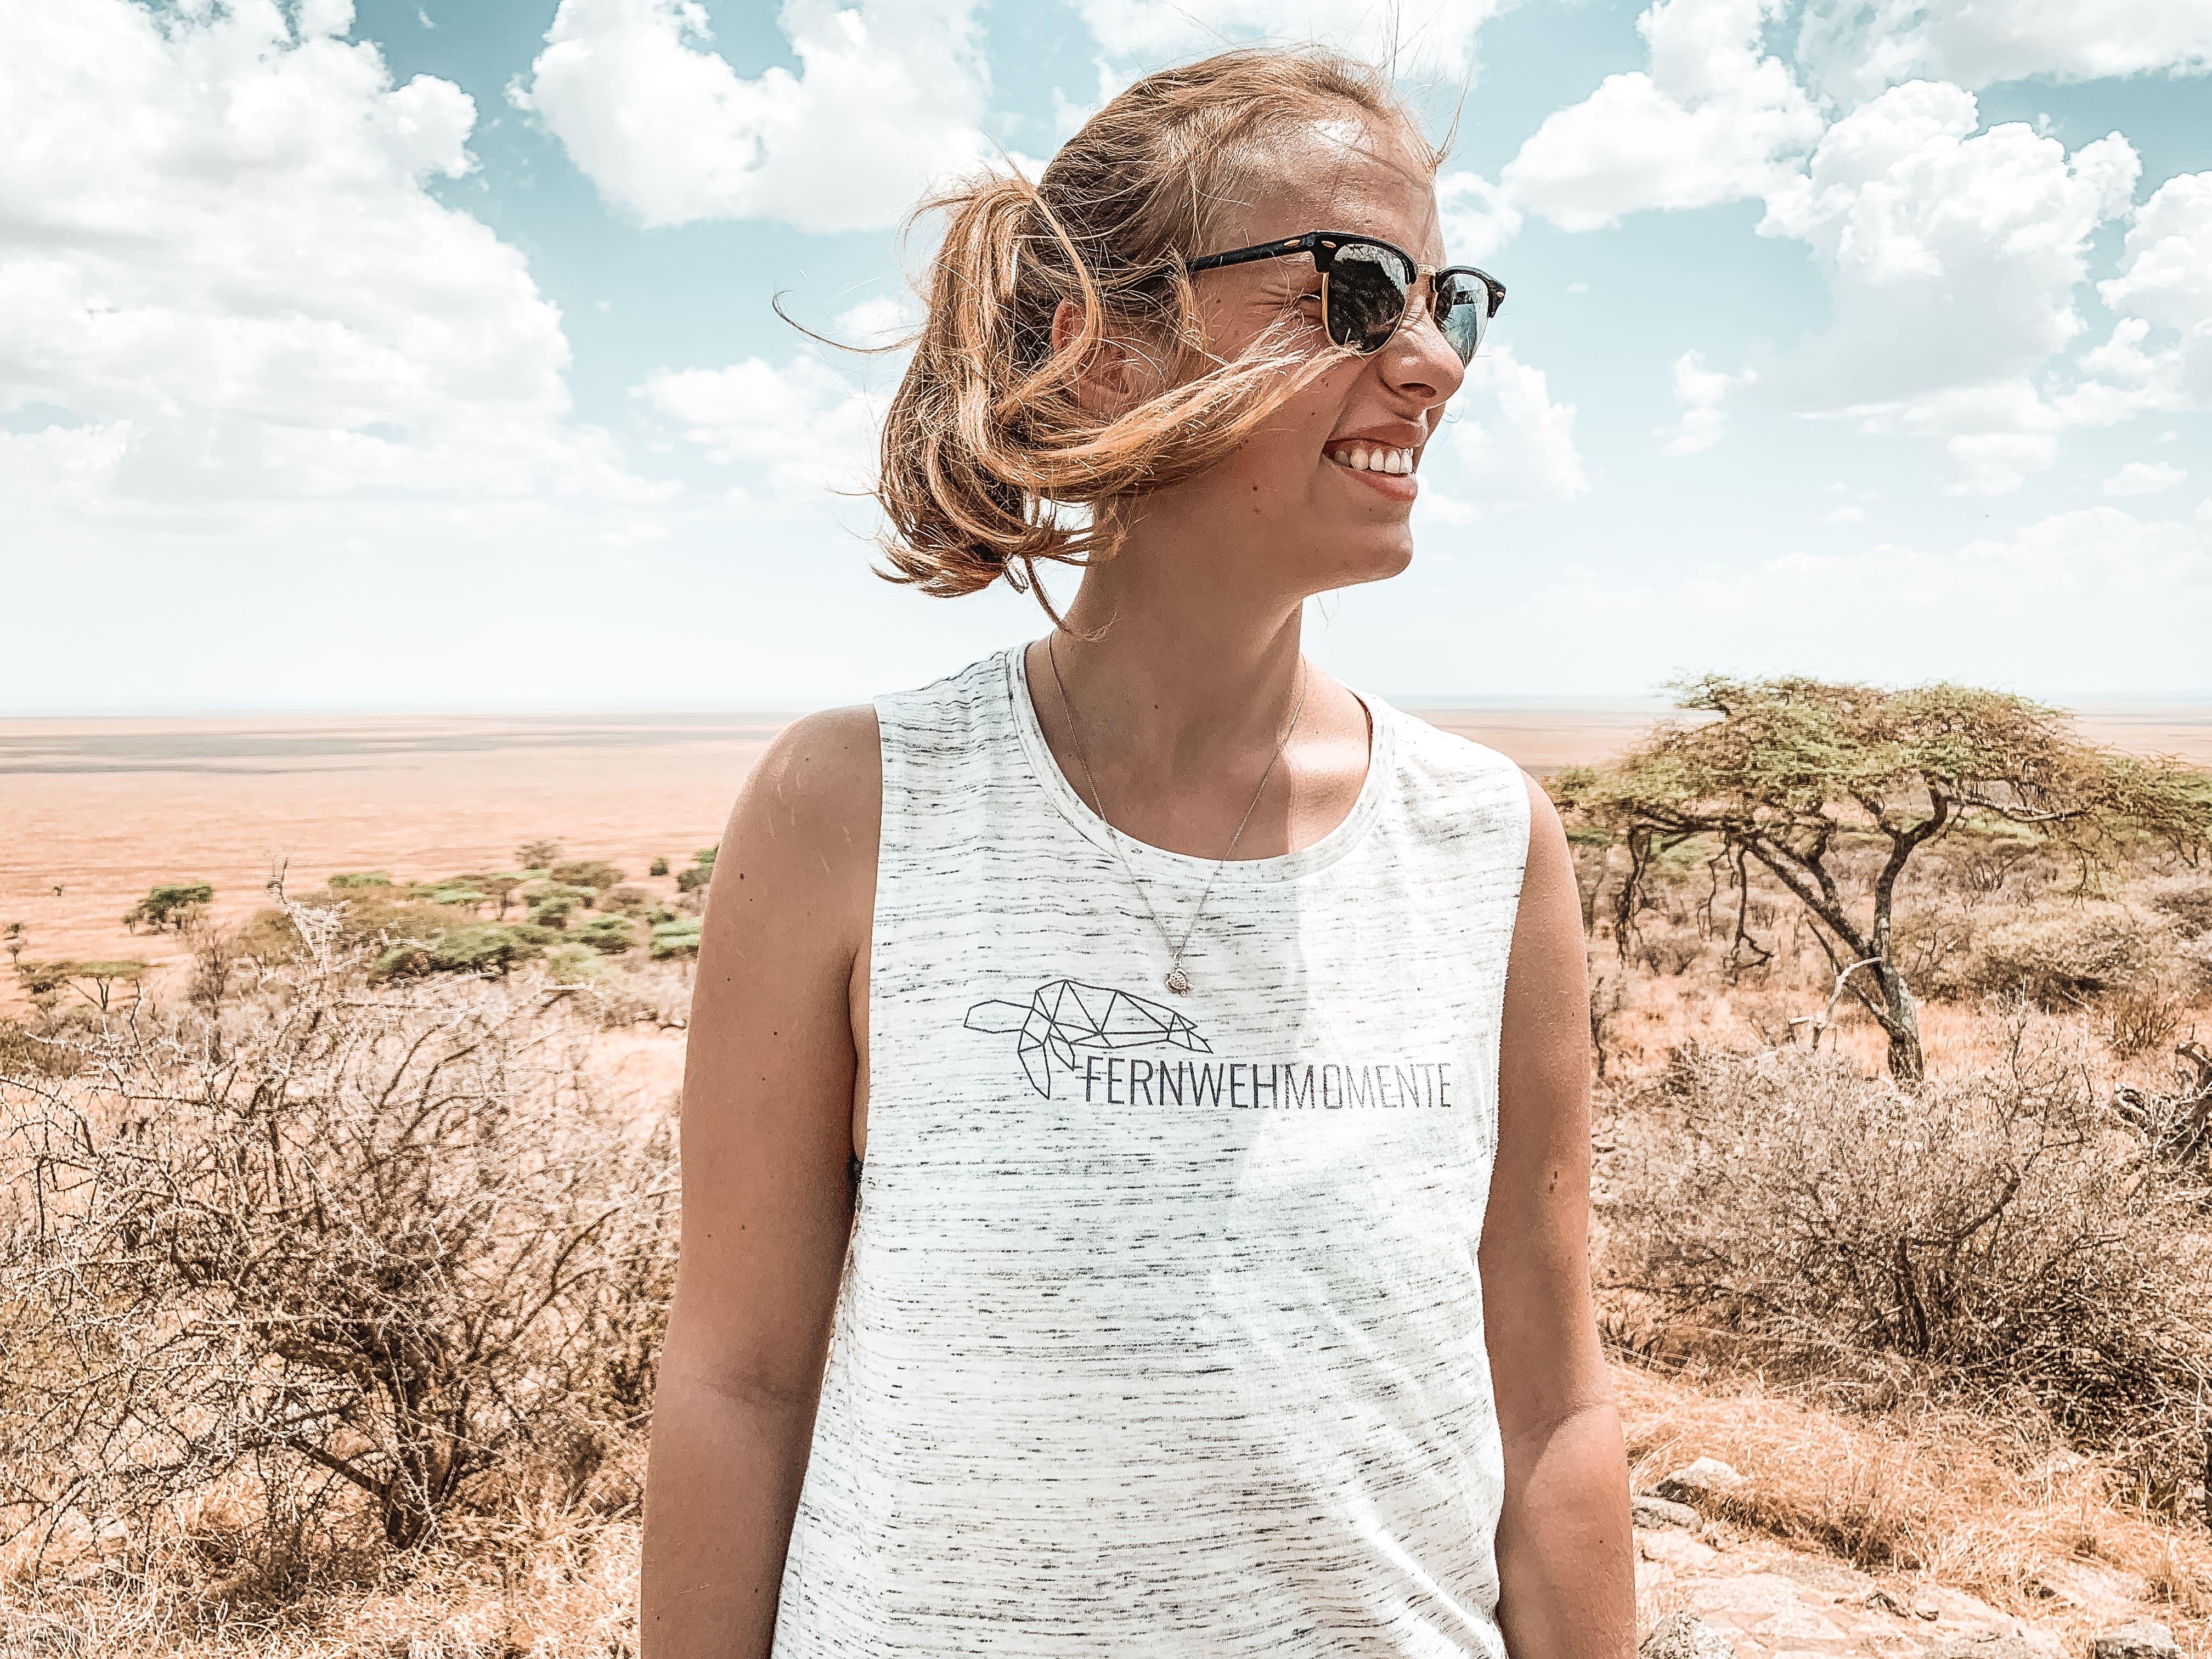 Fernwehmomente auf Tansania Safari